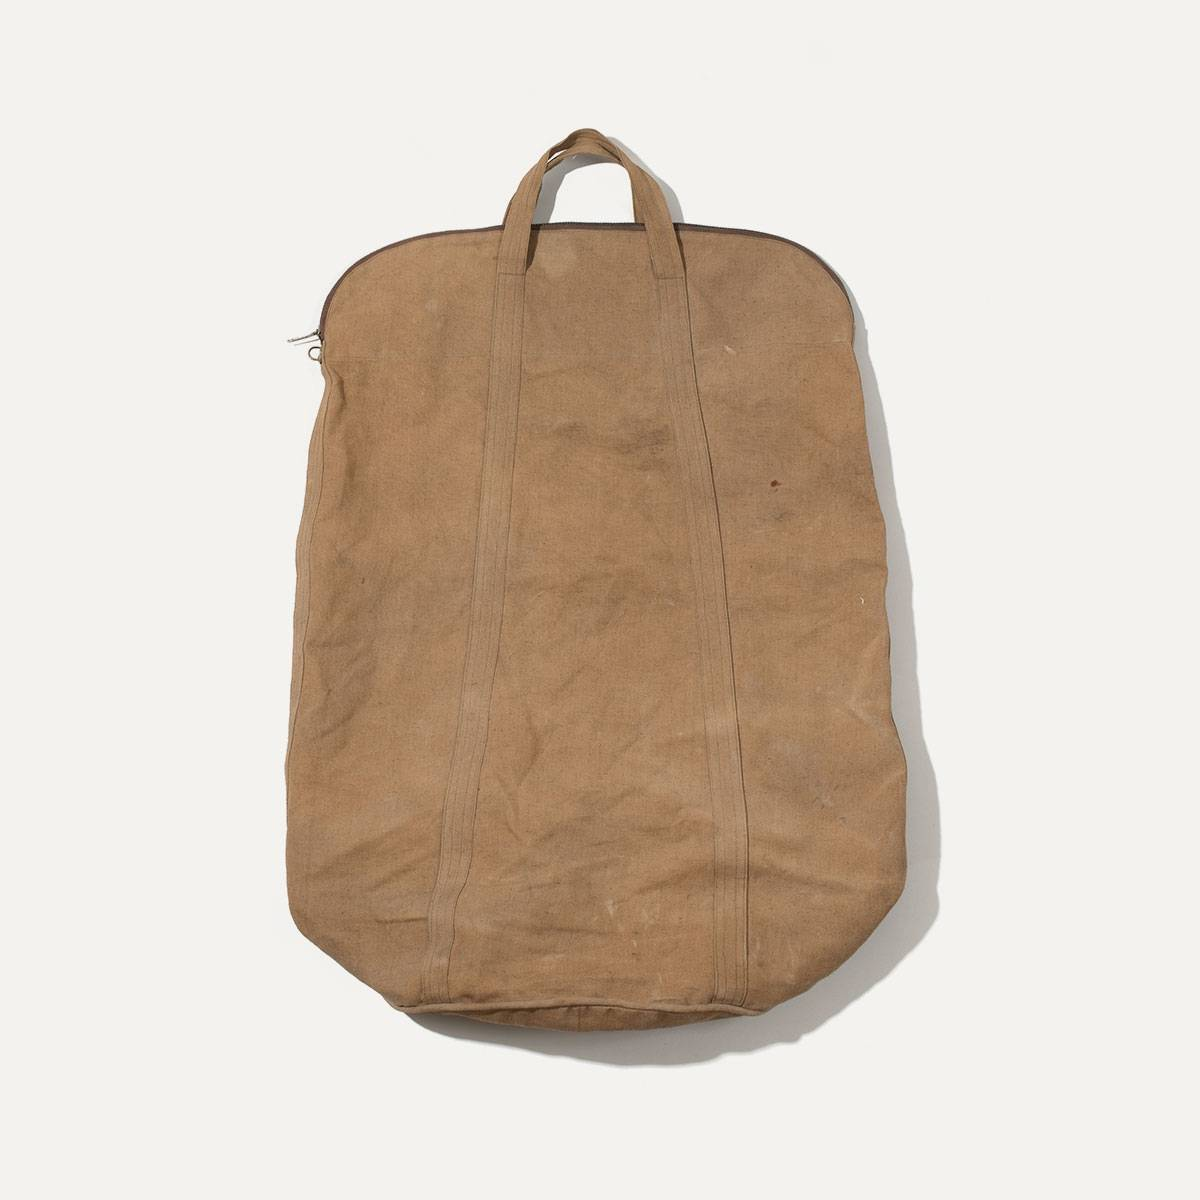 N°4: 'Cashew-colored' linen parachute bag (image n°1)